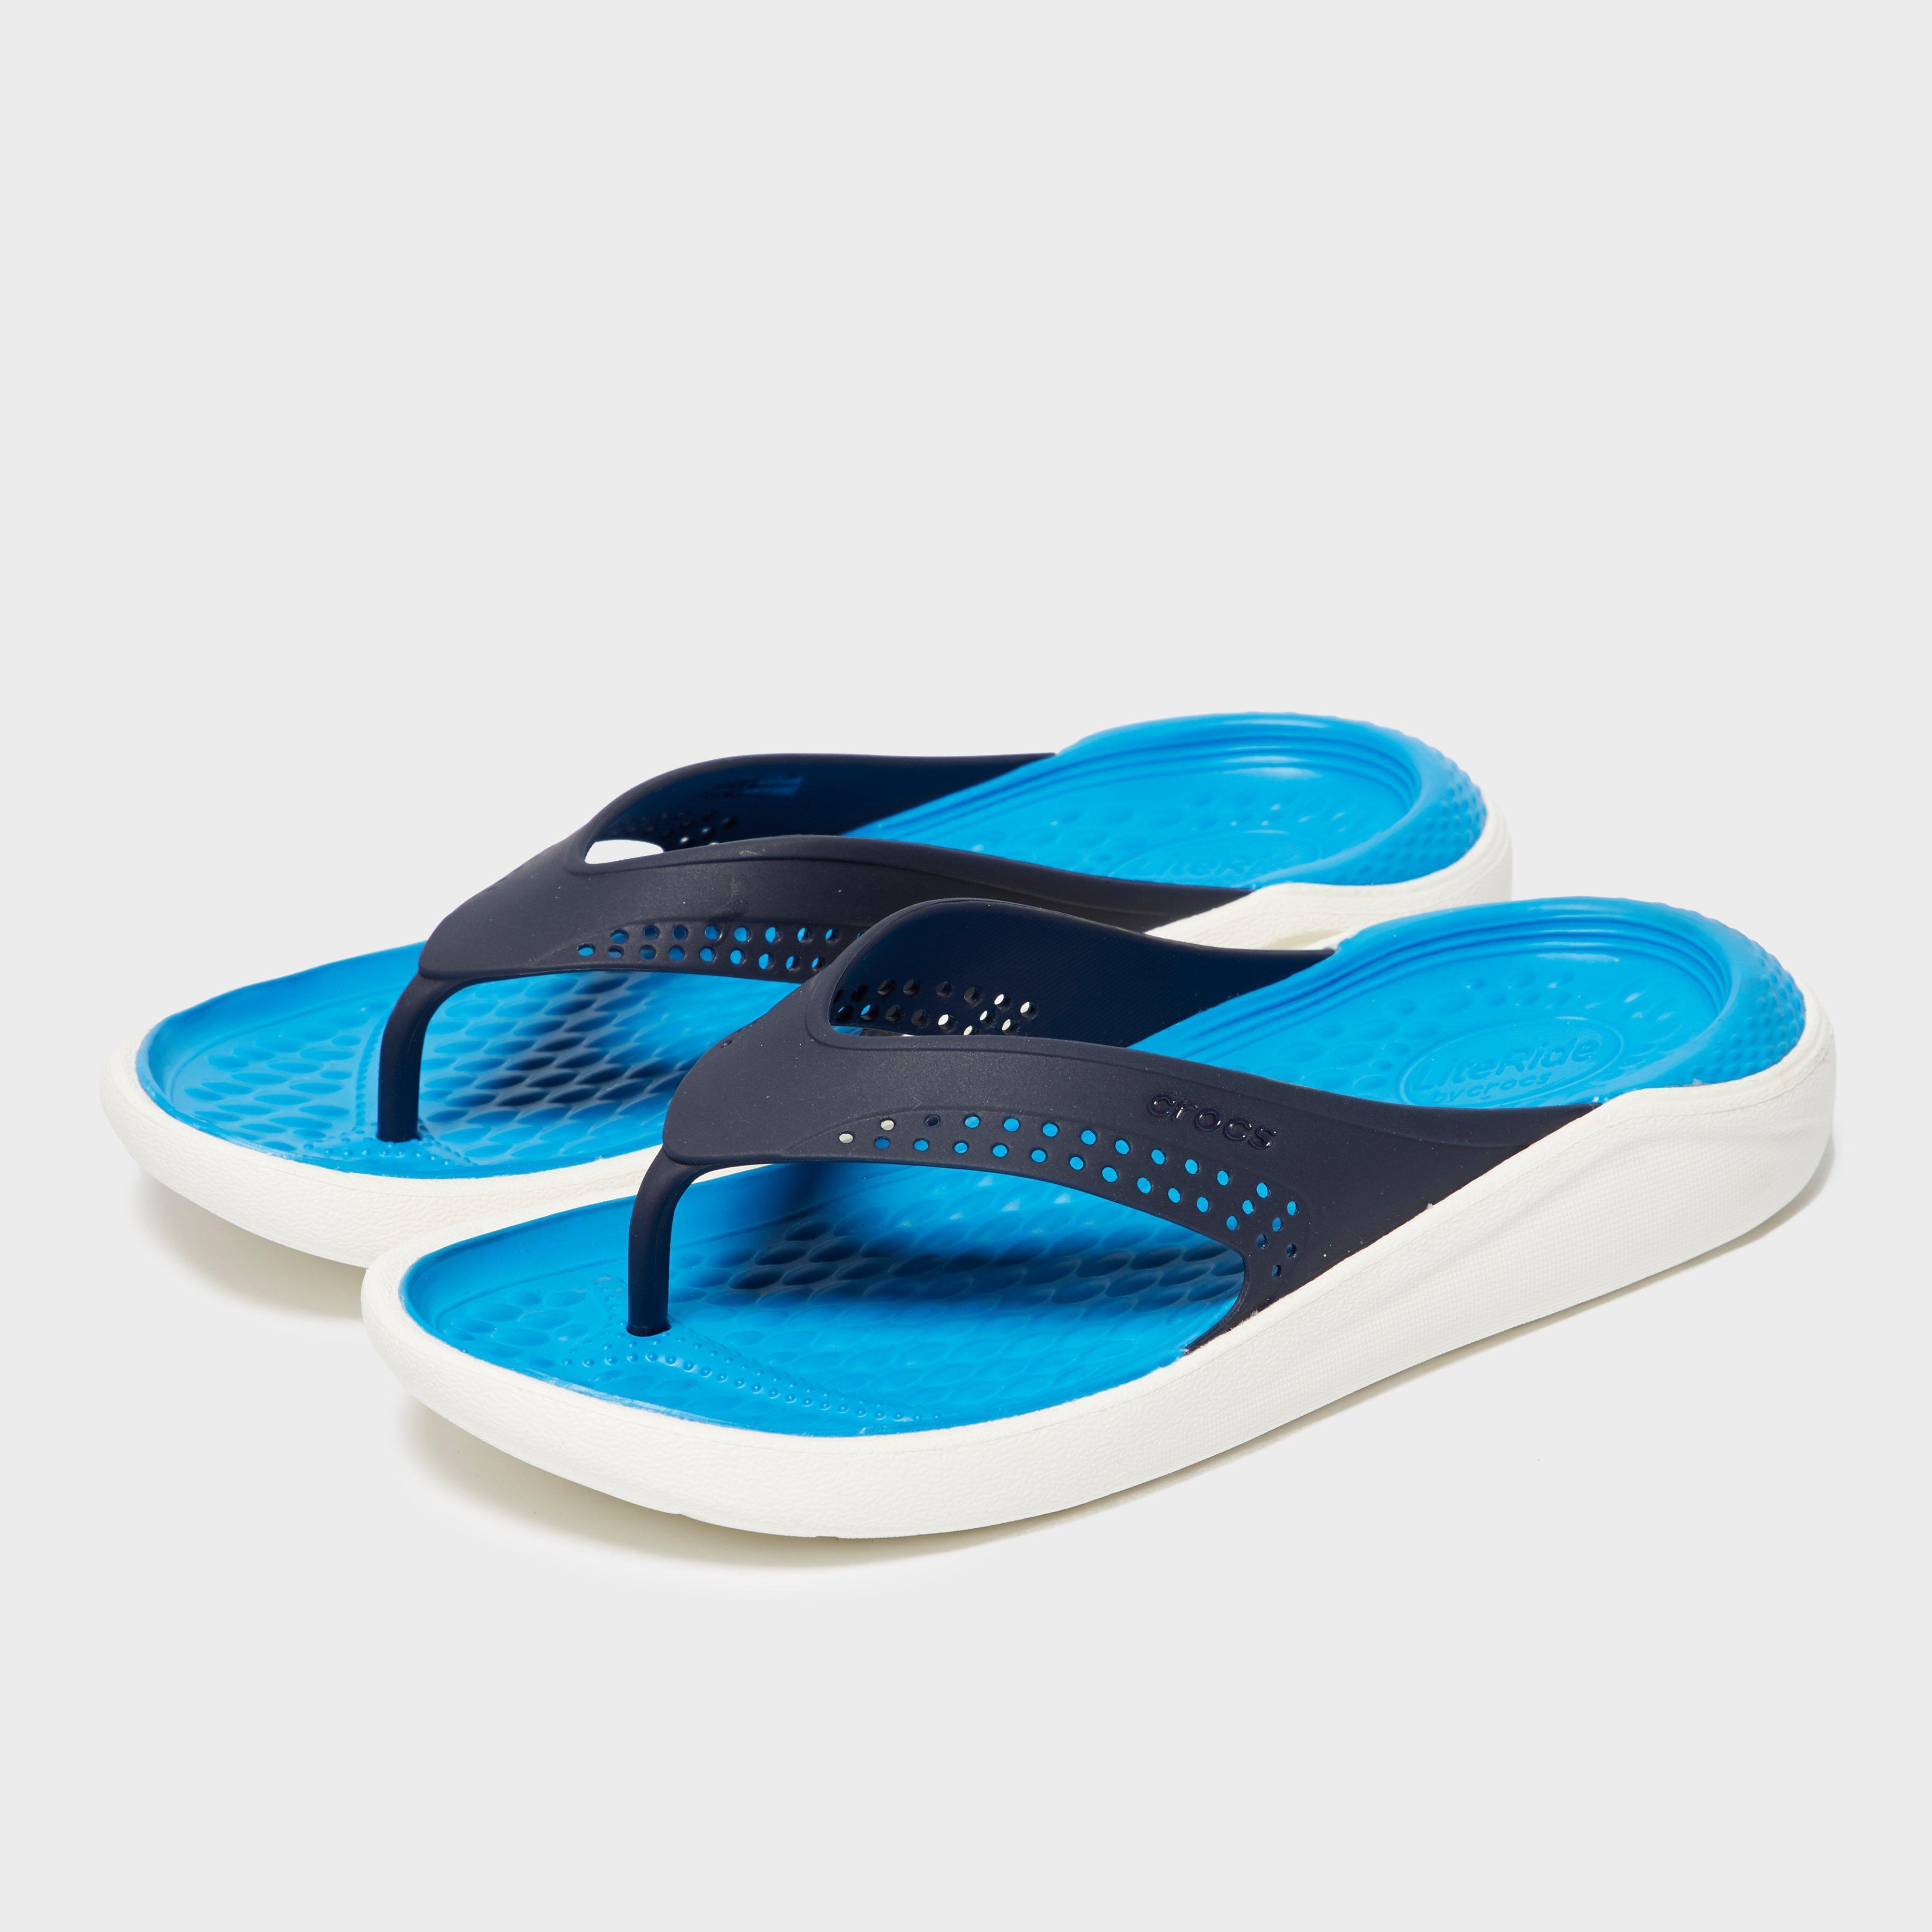 Crocs Women's Literide Flip - Blue/Navy, Blue/Navy